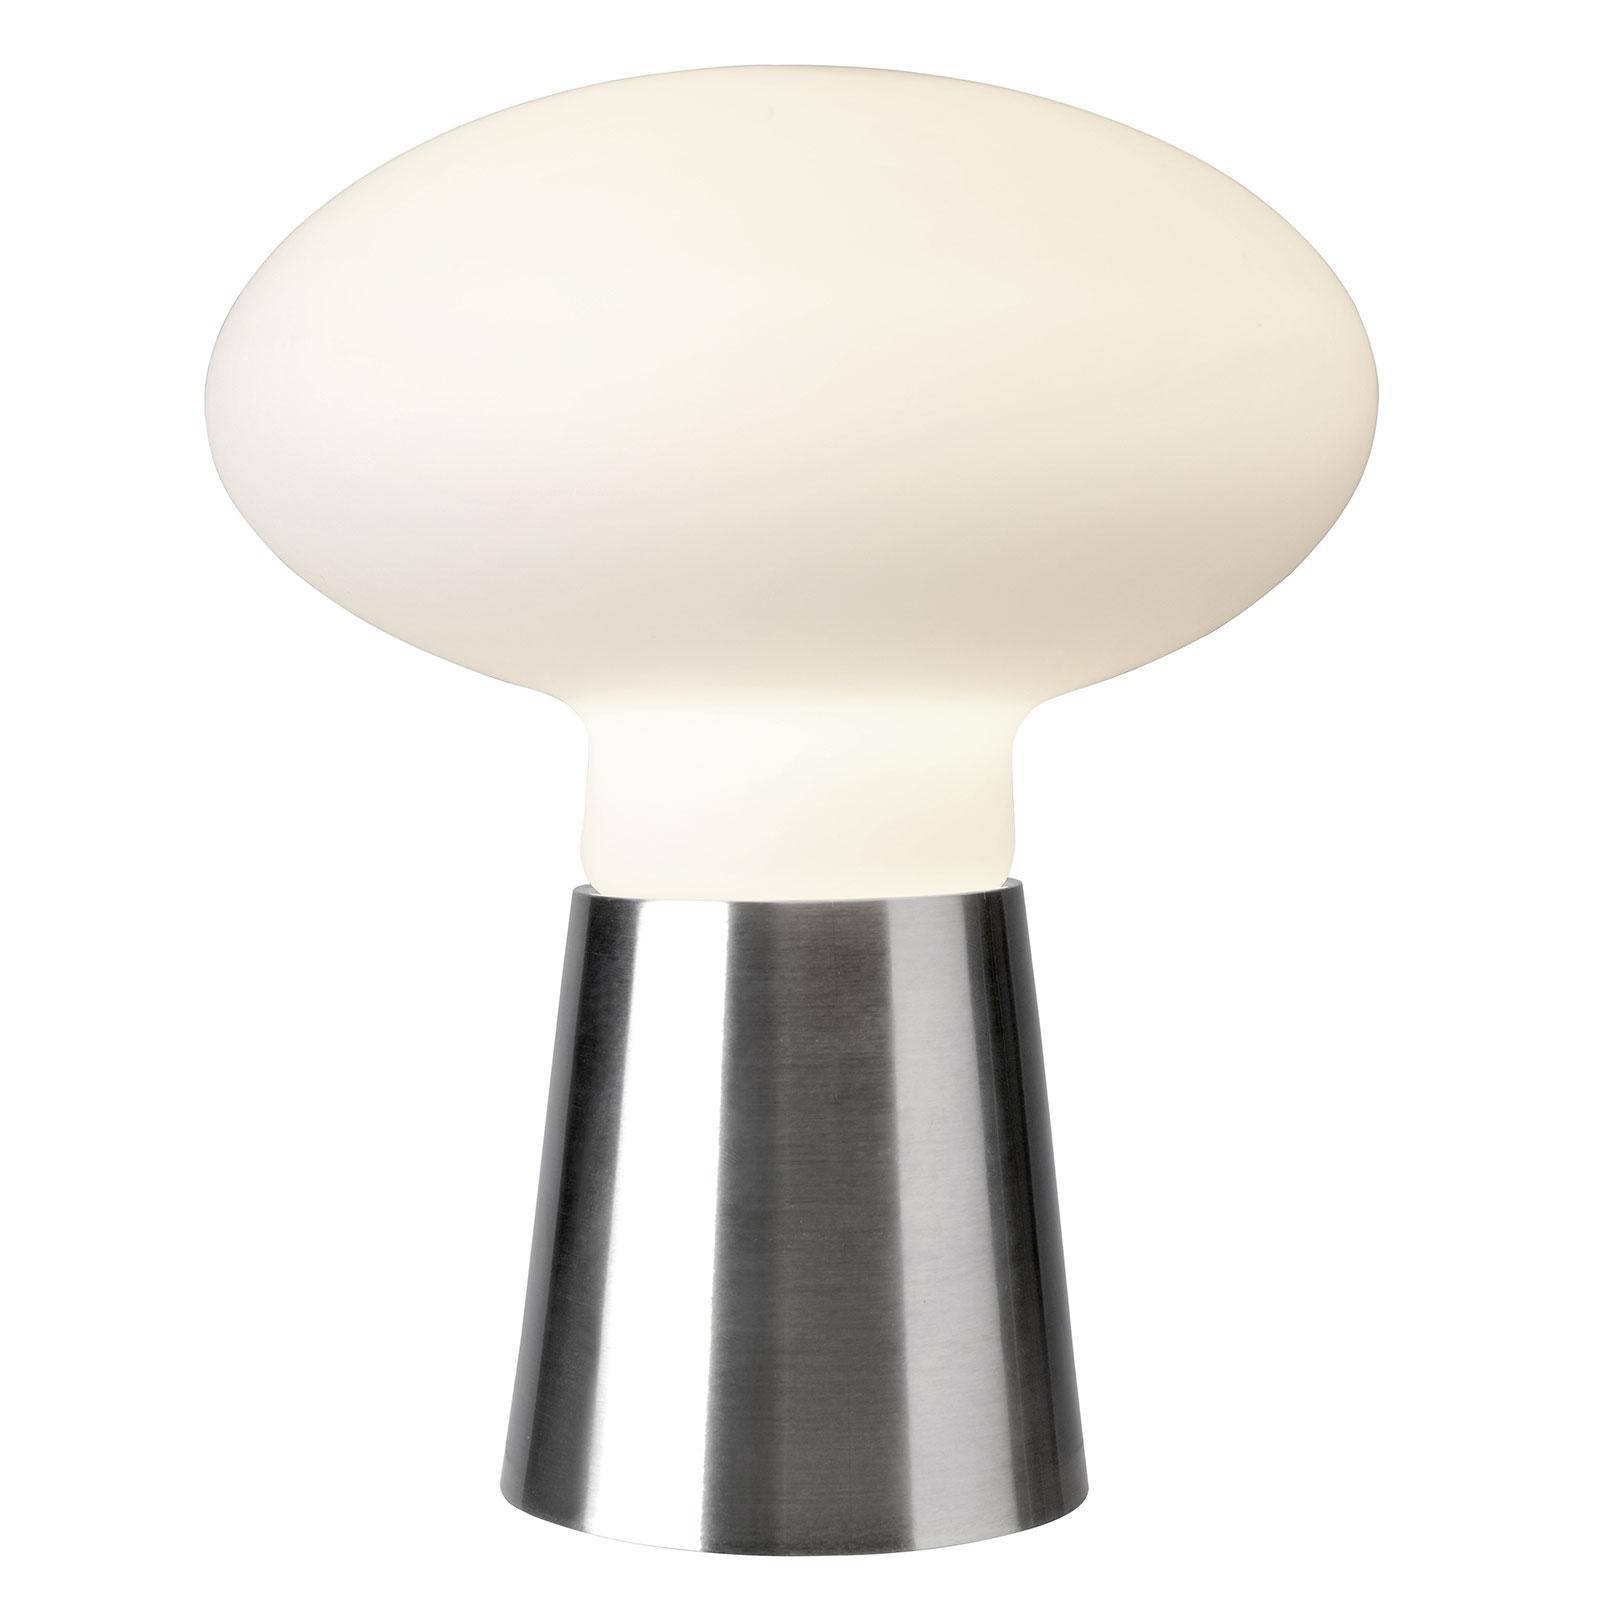 Villeroy & Boch Bilbao lampe à poser satinée 35cm